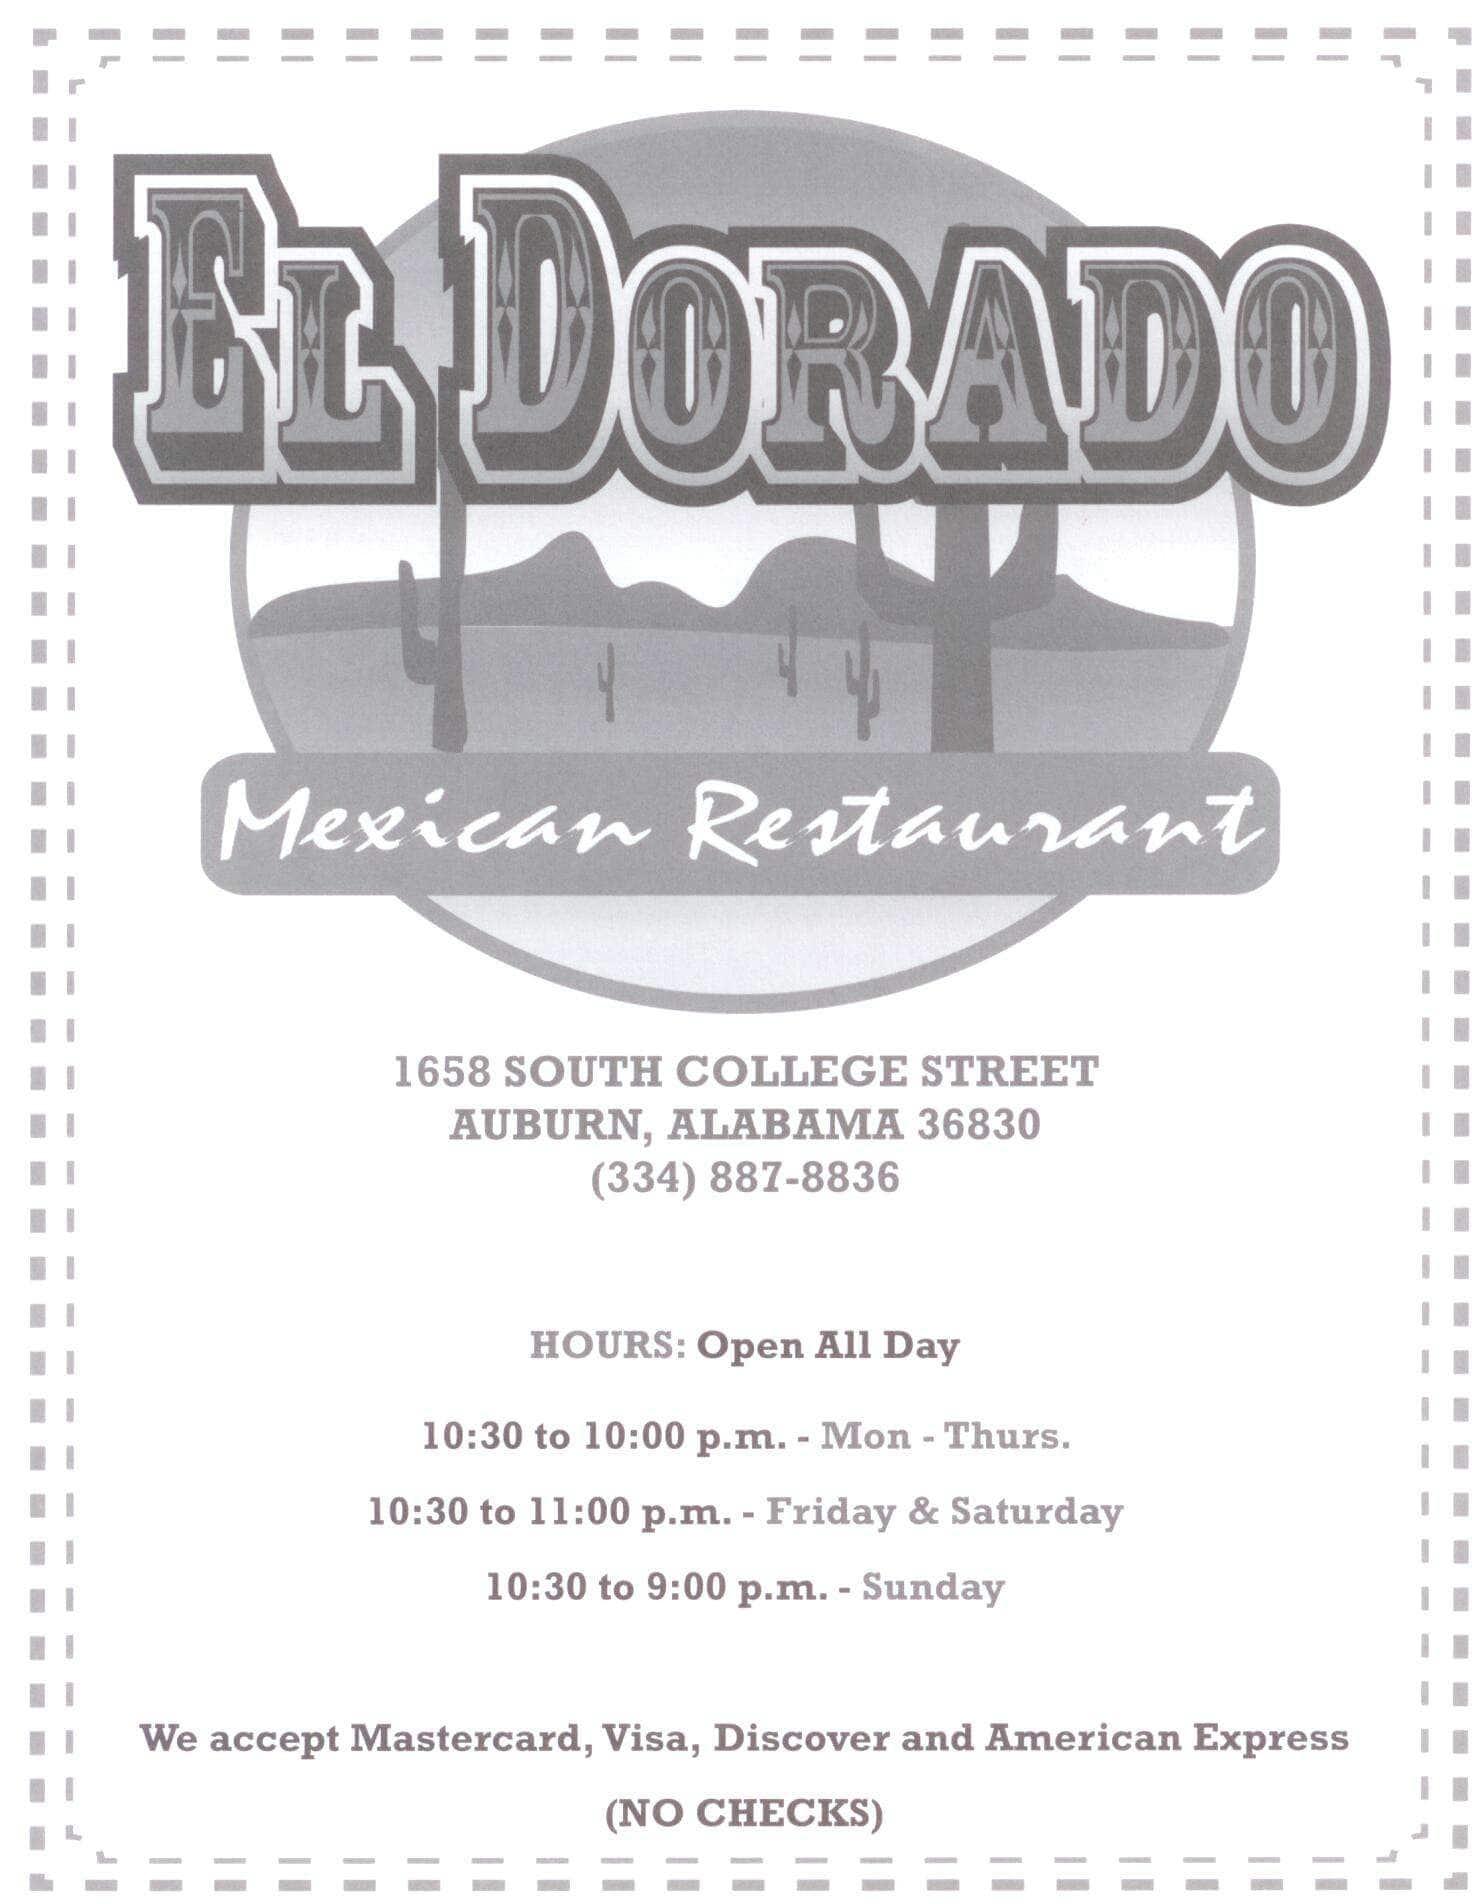 El Dorado Auburn Menu